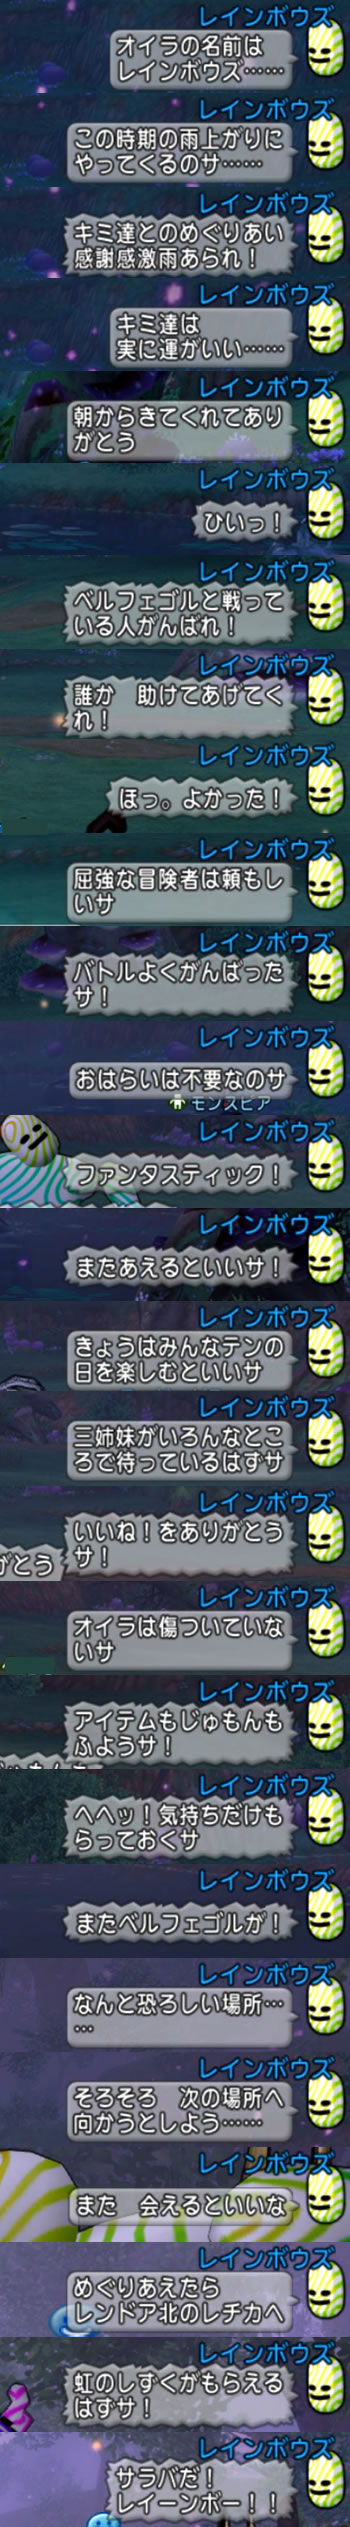 2016_11_10_1